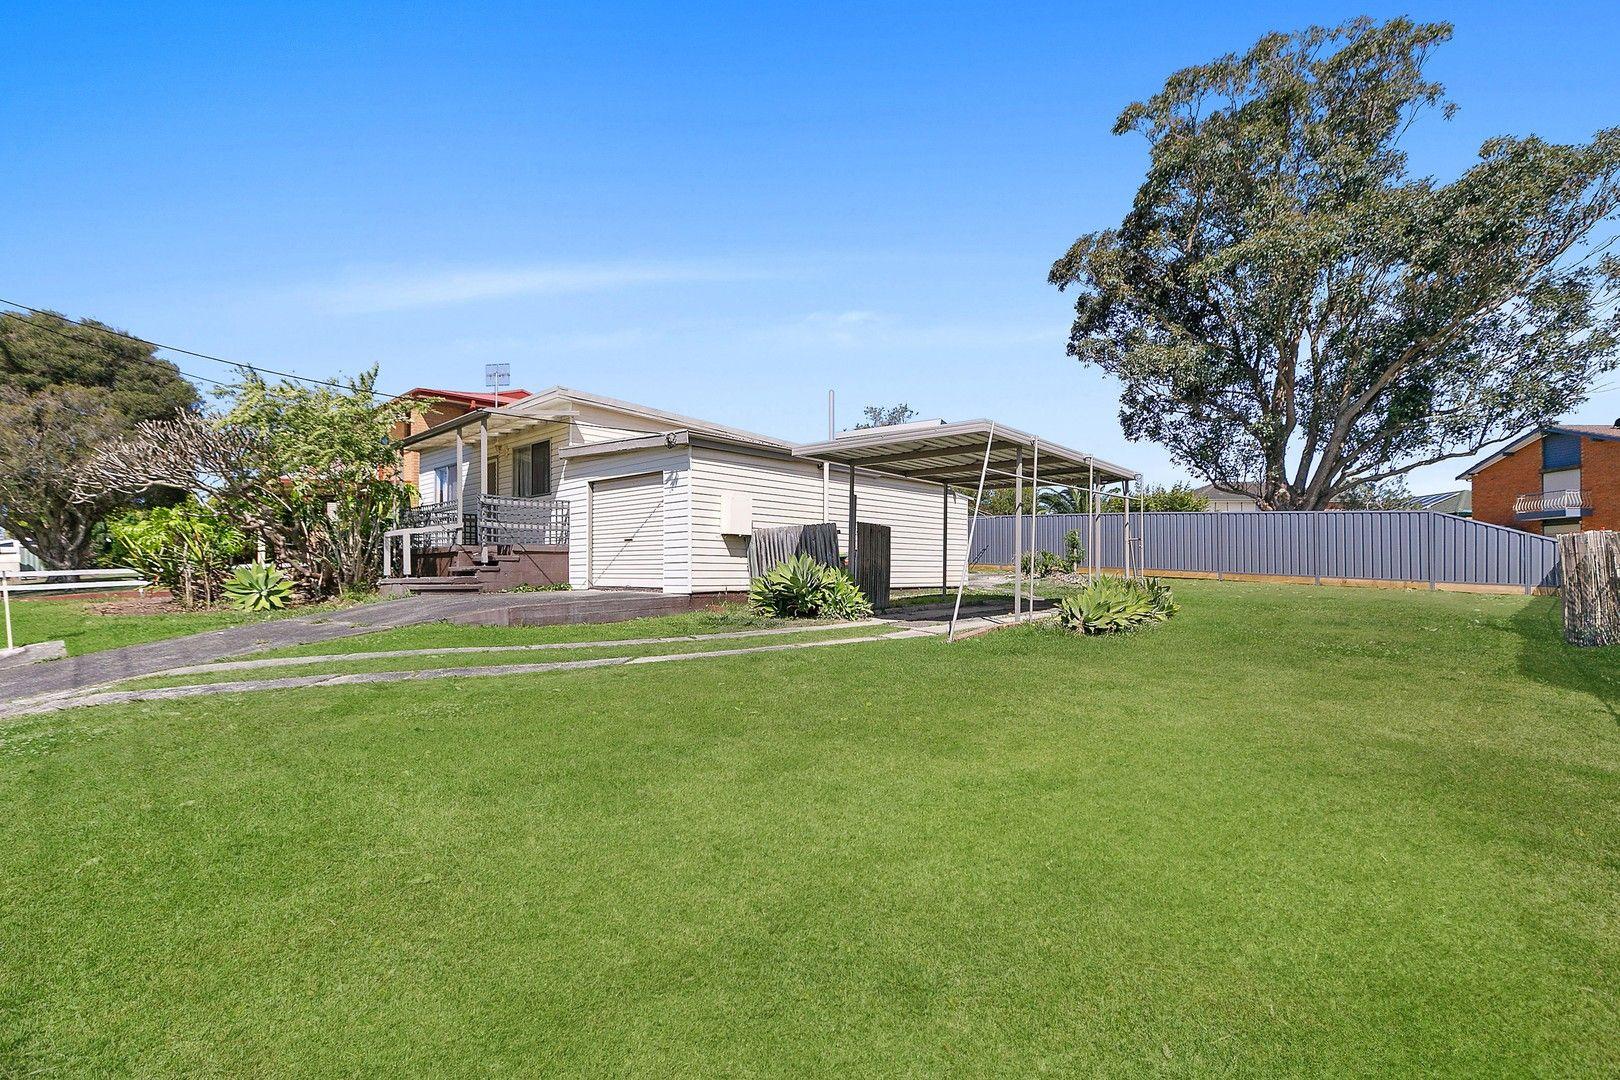 28 Torres Street, Killarney Vale NSW 2261, Image 0